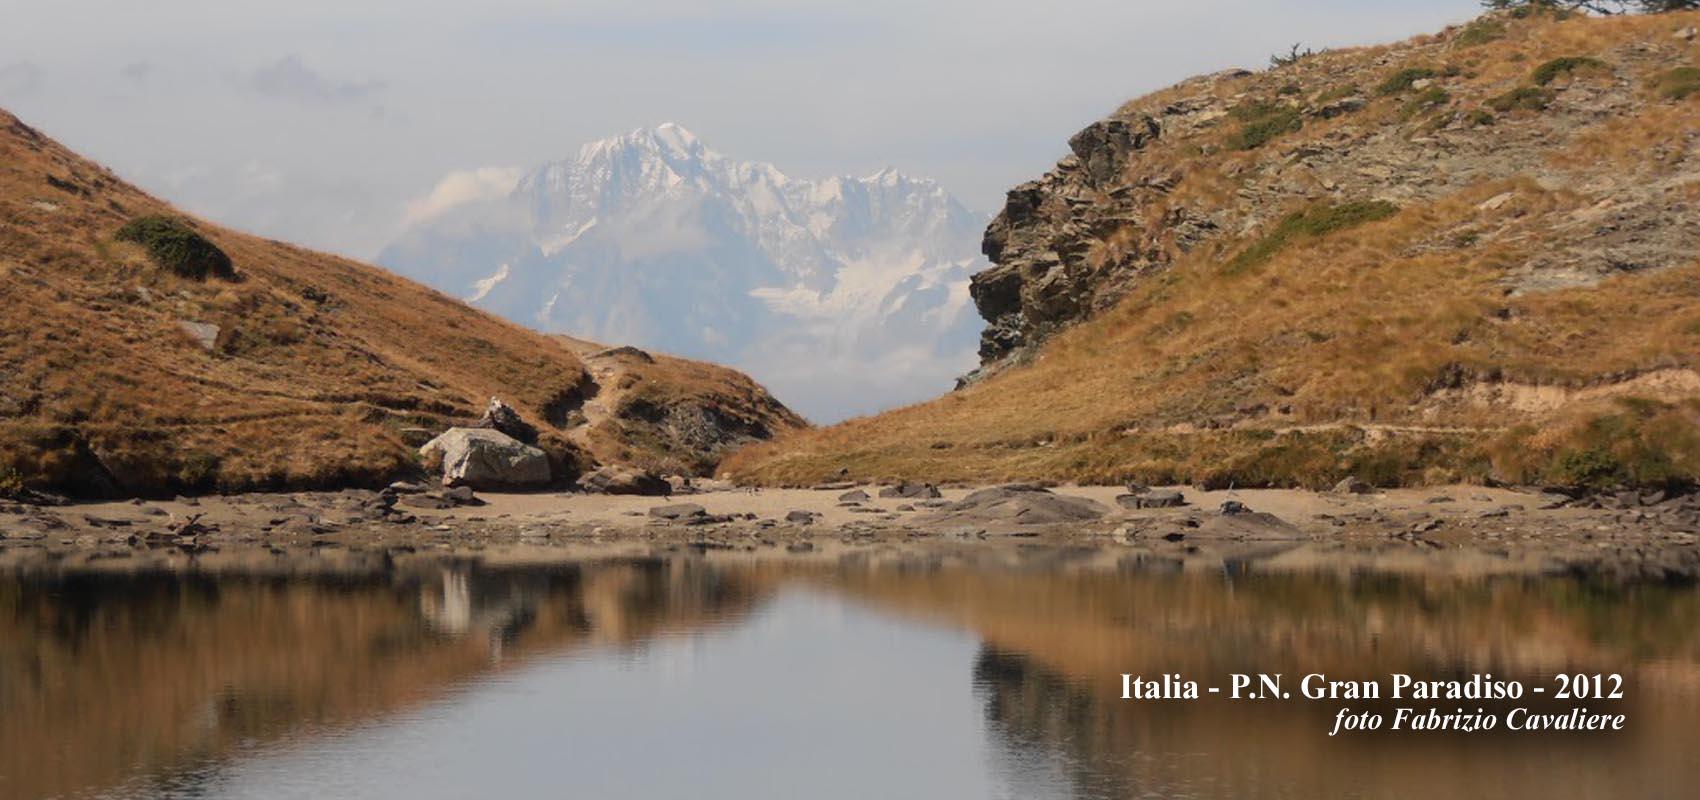 Italia, PN Gran Paradiso - 2012